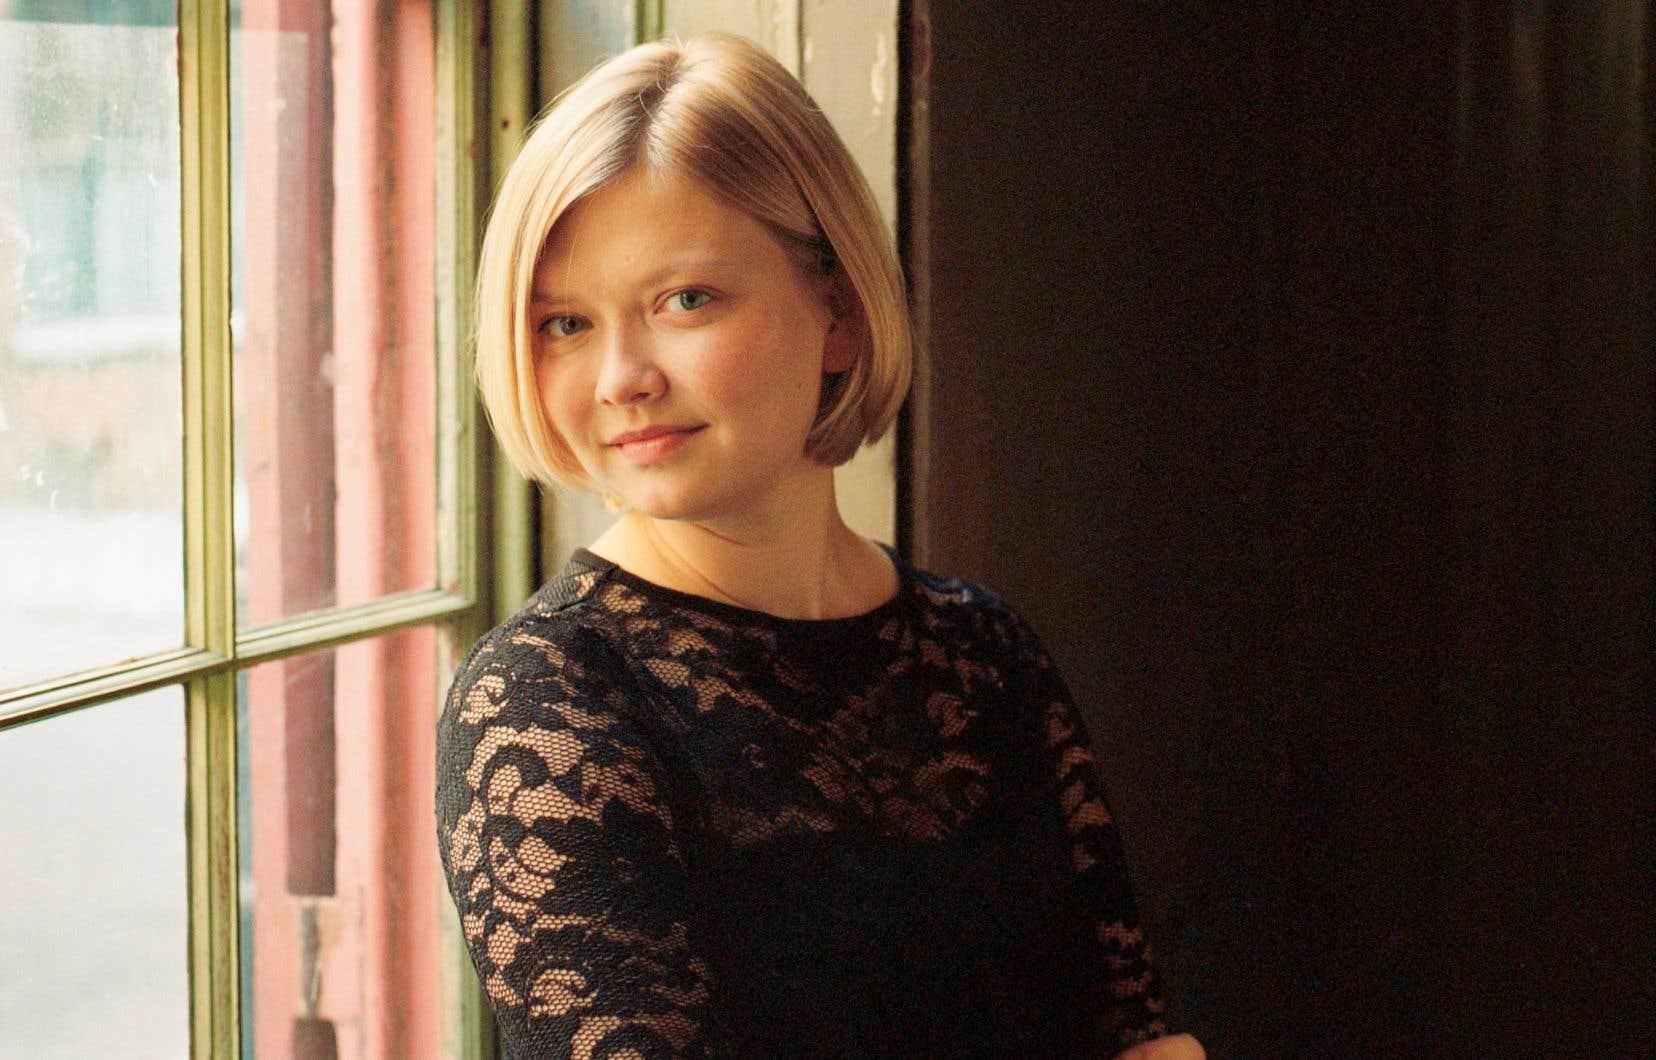 «La violoniste Alina Ibragimova a immortalisé les